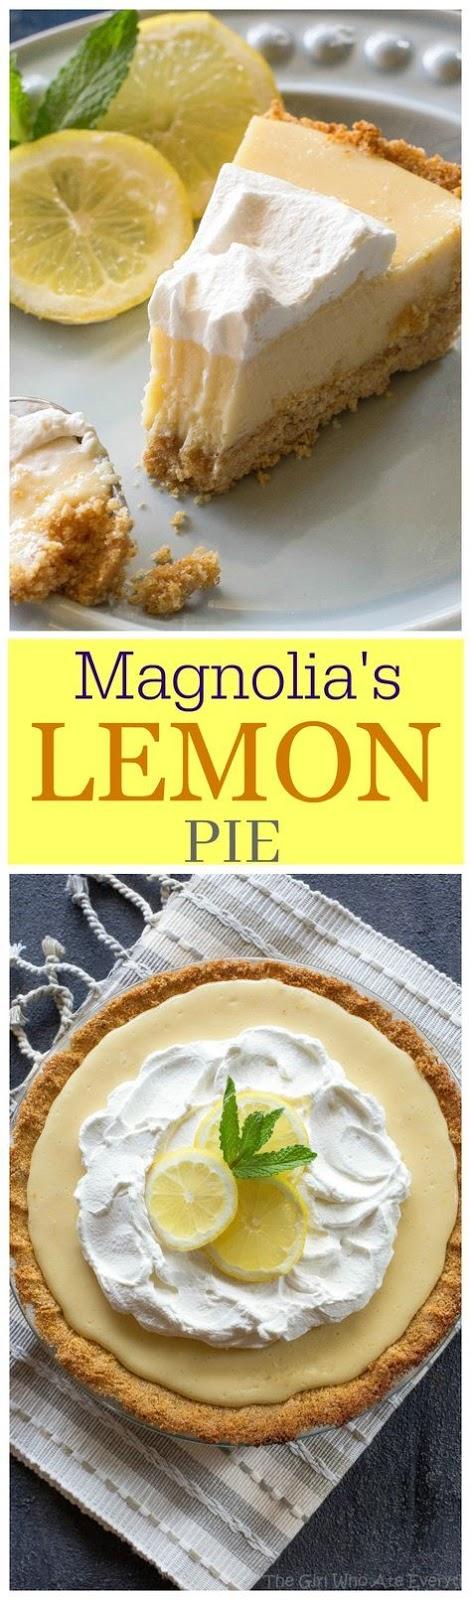 Magnolias Lemon Pie